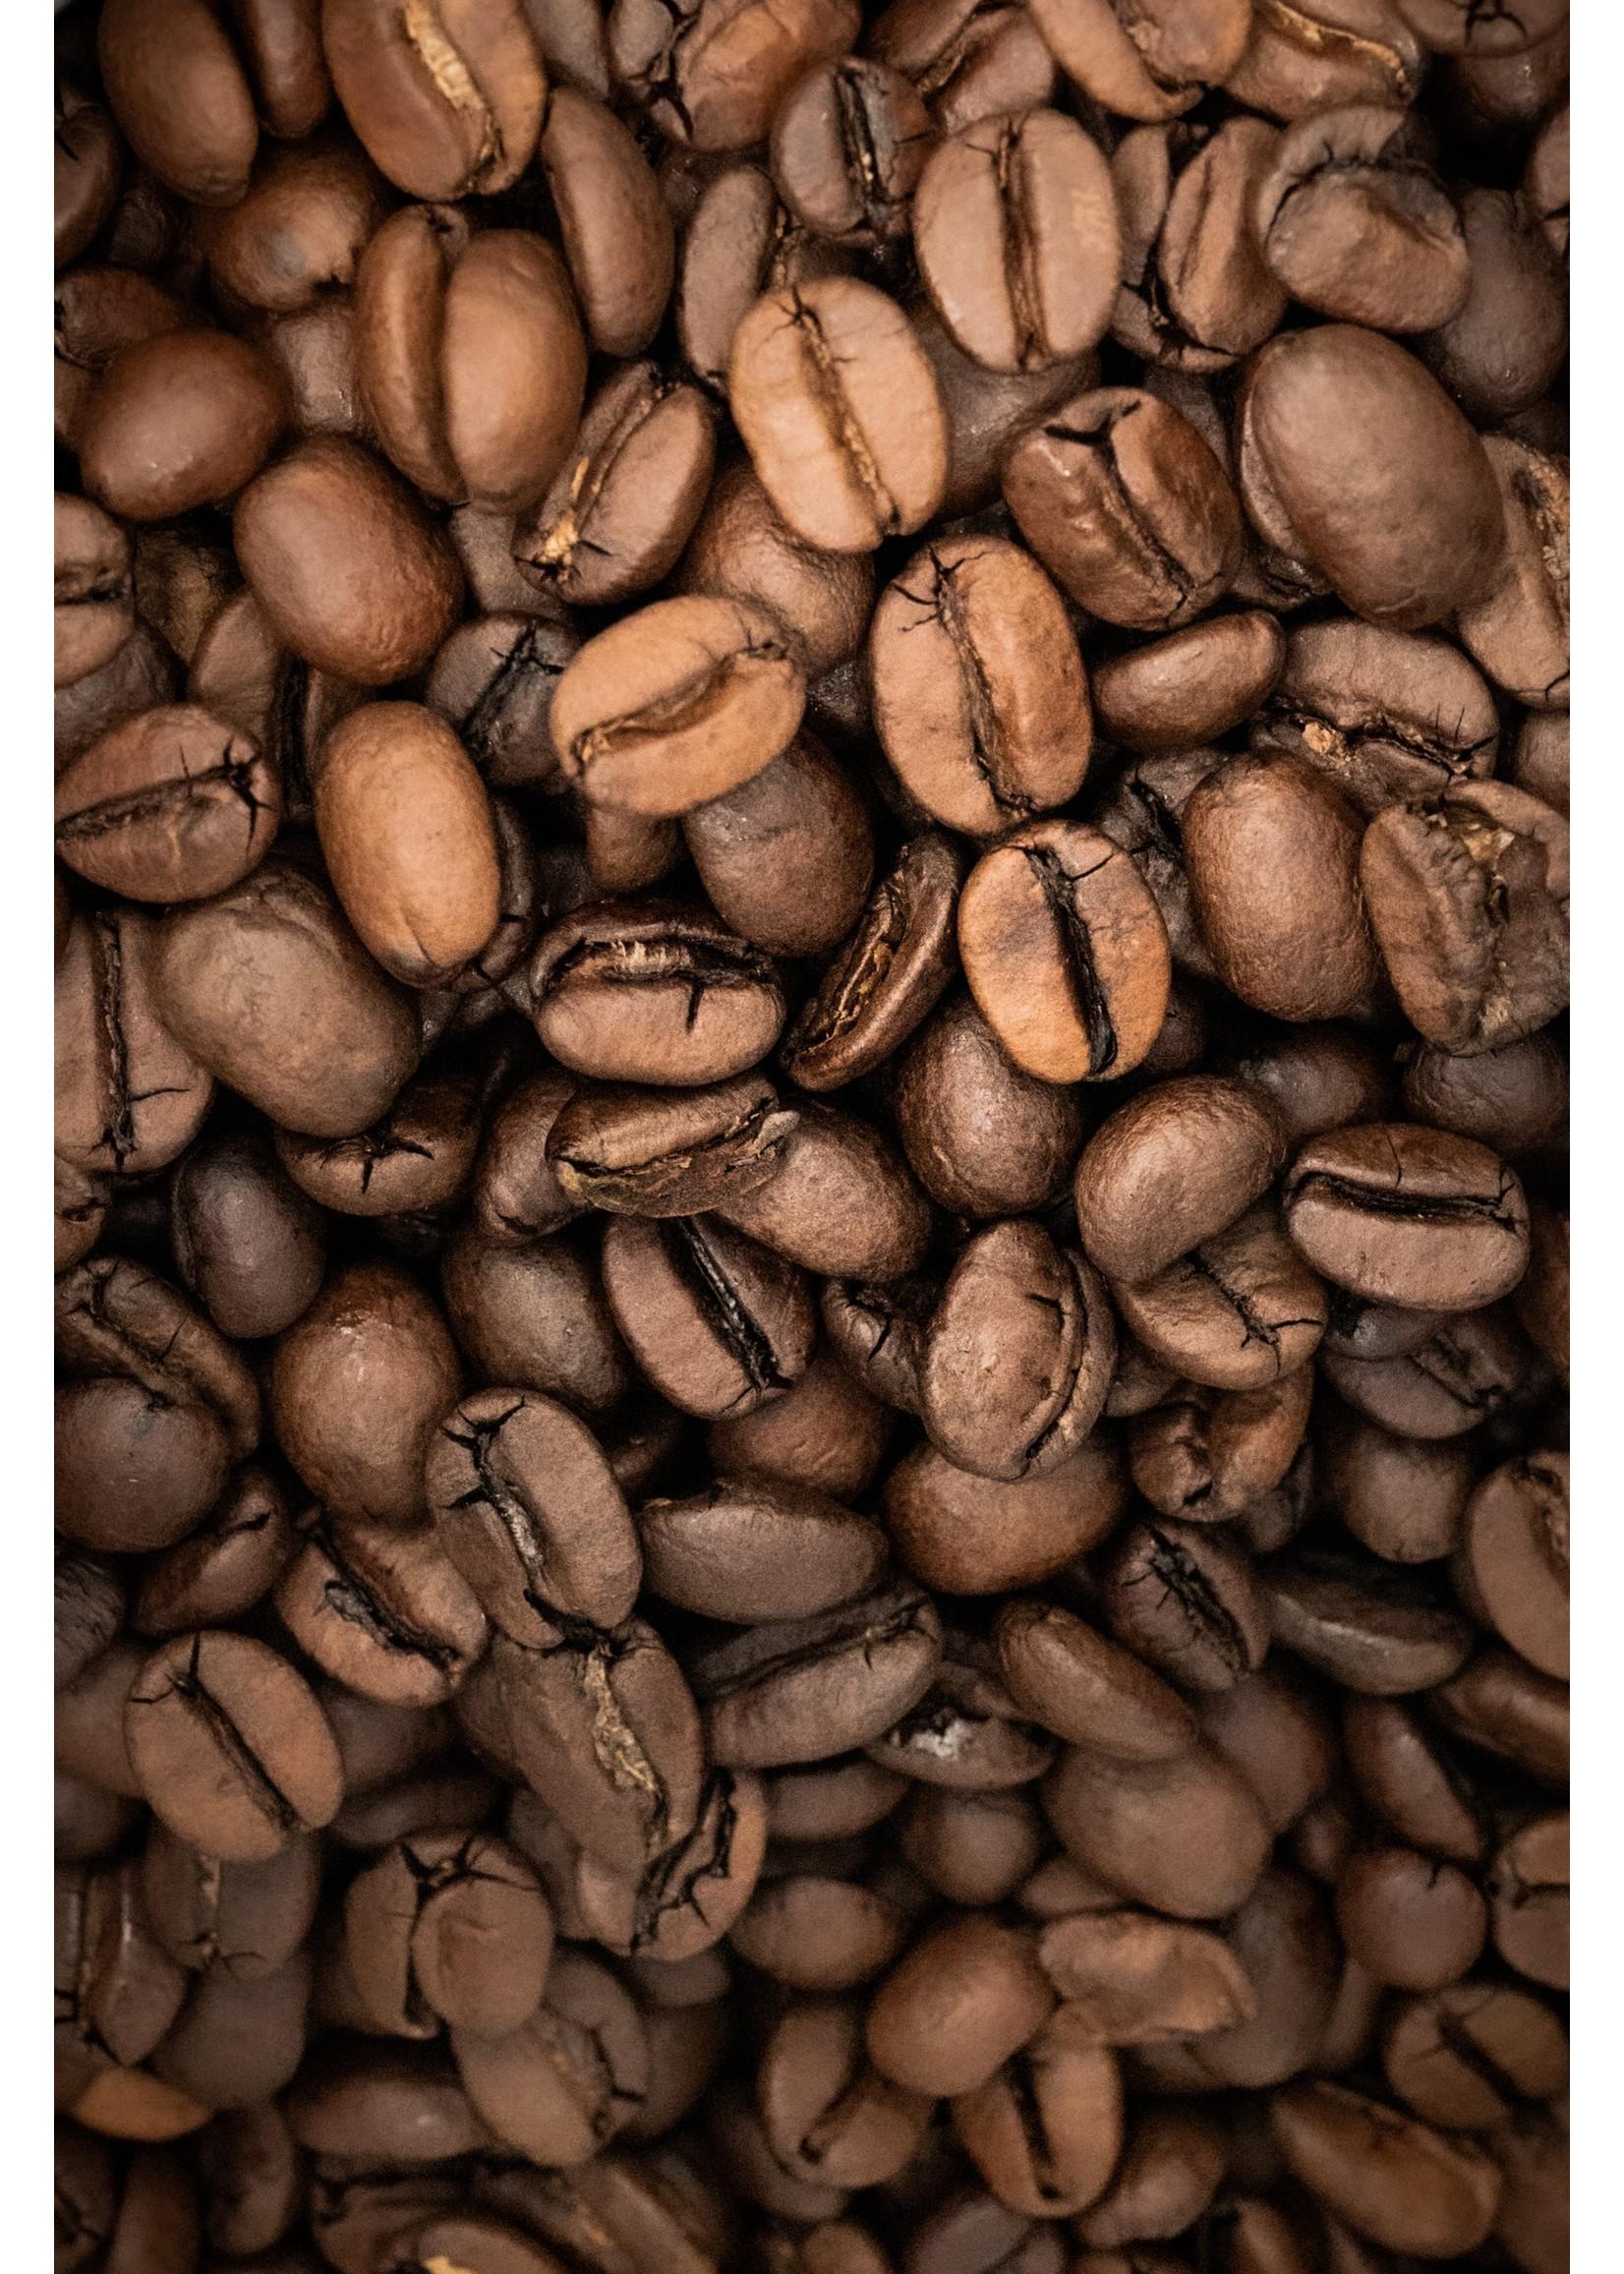 De KoffieMeulen Cafeïnevrije Arabica